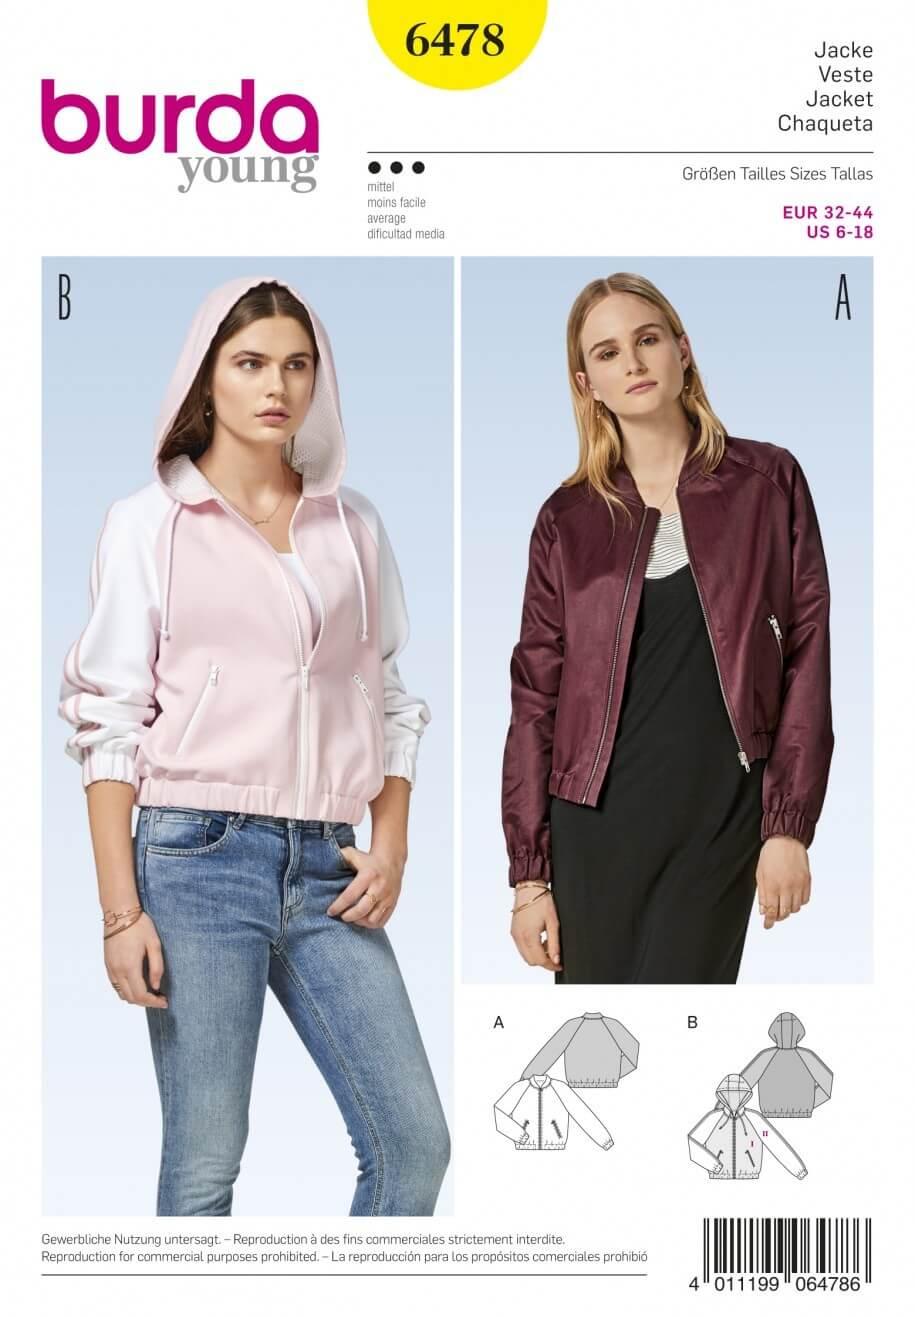 Burda Style Women's Bomber Jacket With Optional Hood Sewing Pattern 6478